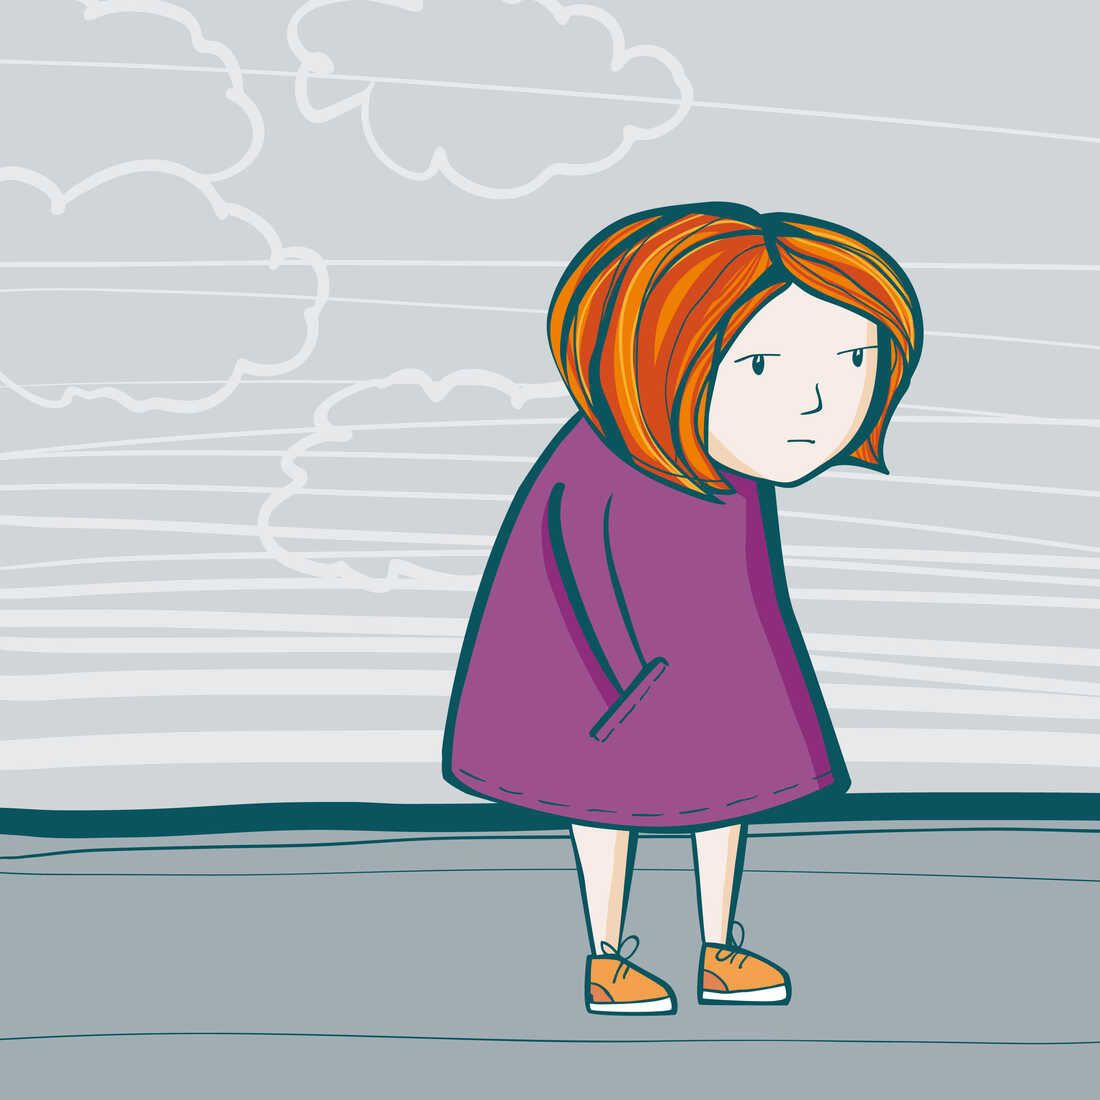 A young girl feeling sad.